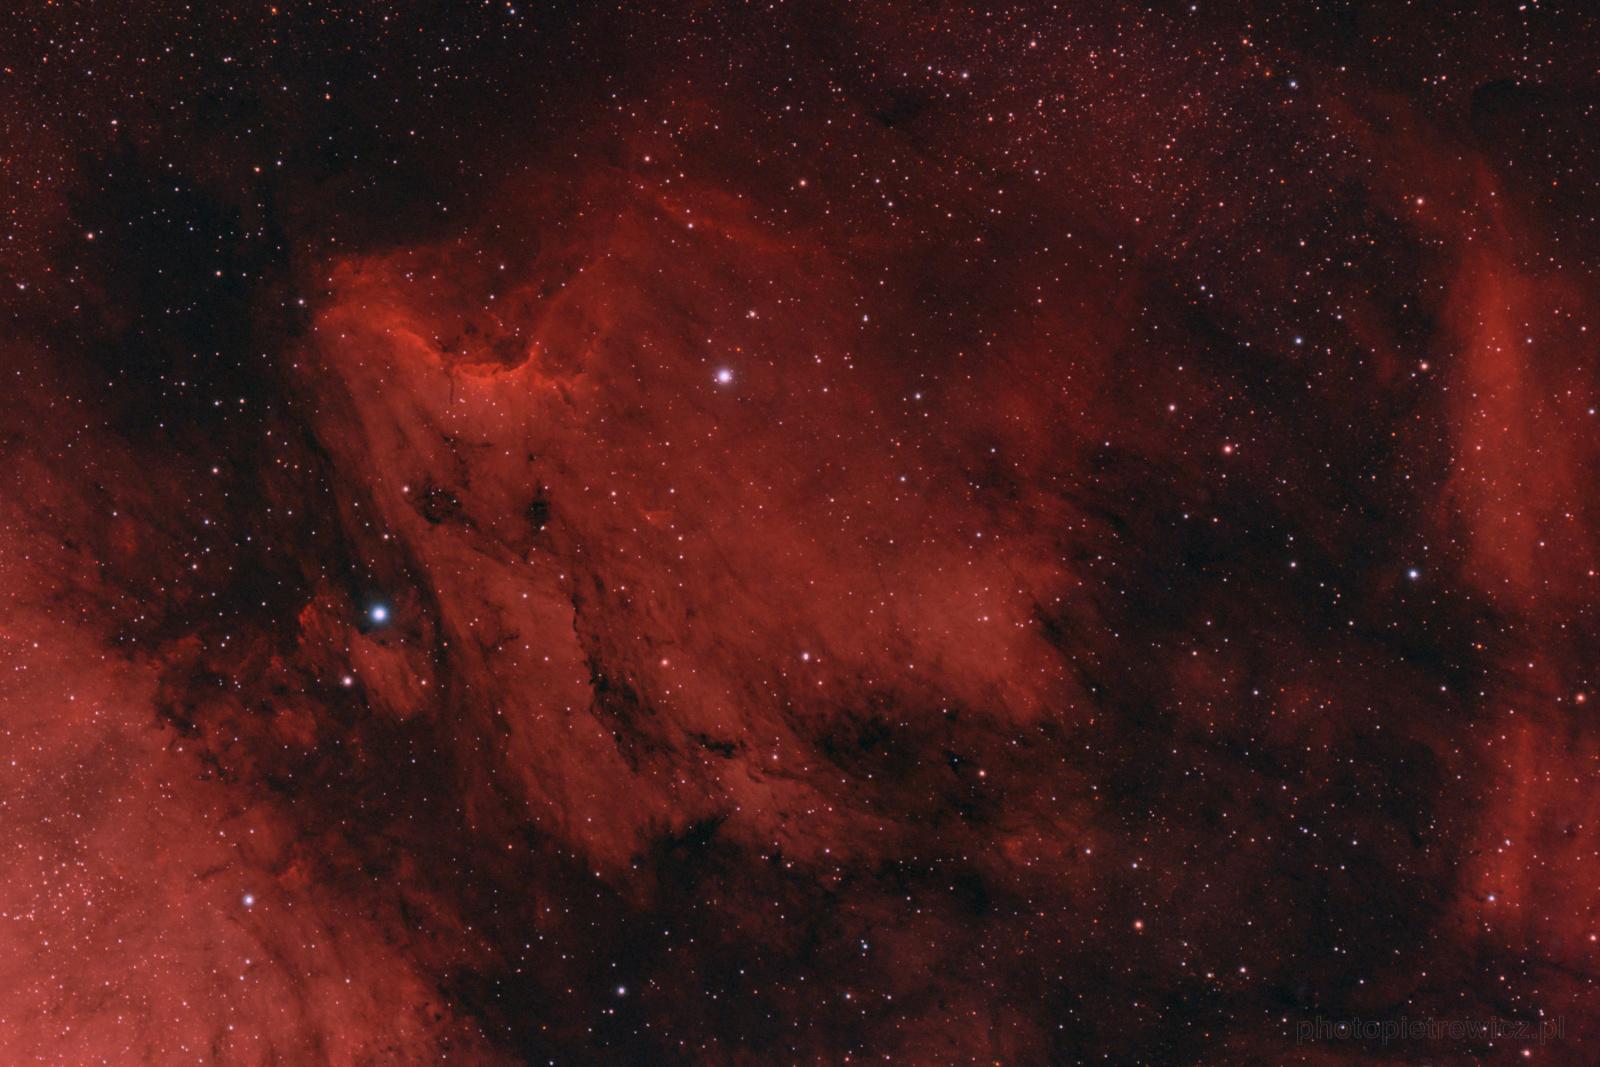 pelican3b.thumb.jpg.84ba25e9406e018d11fb42ed0e62f8c6.jpg